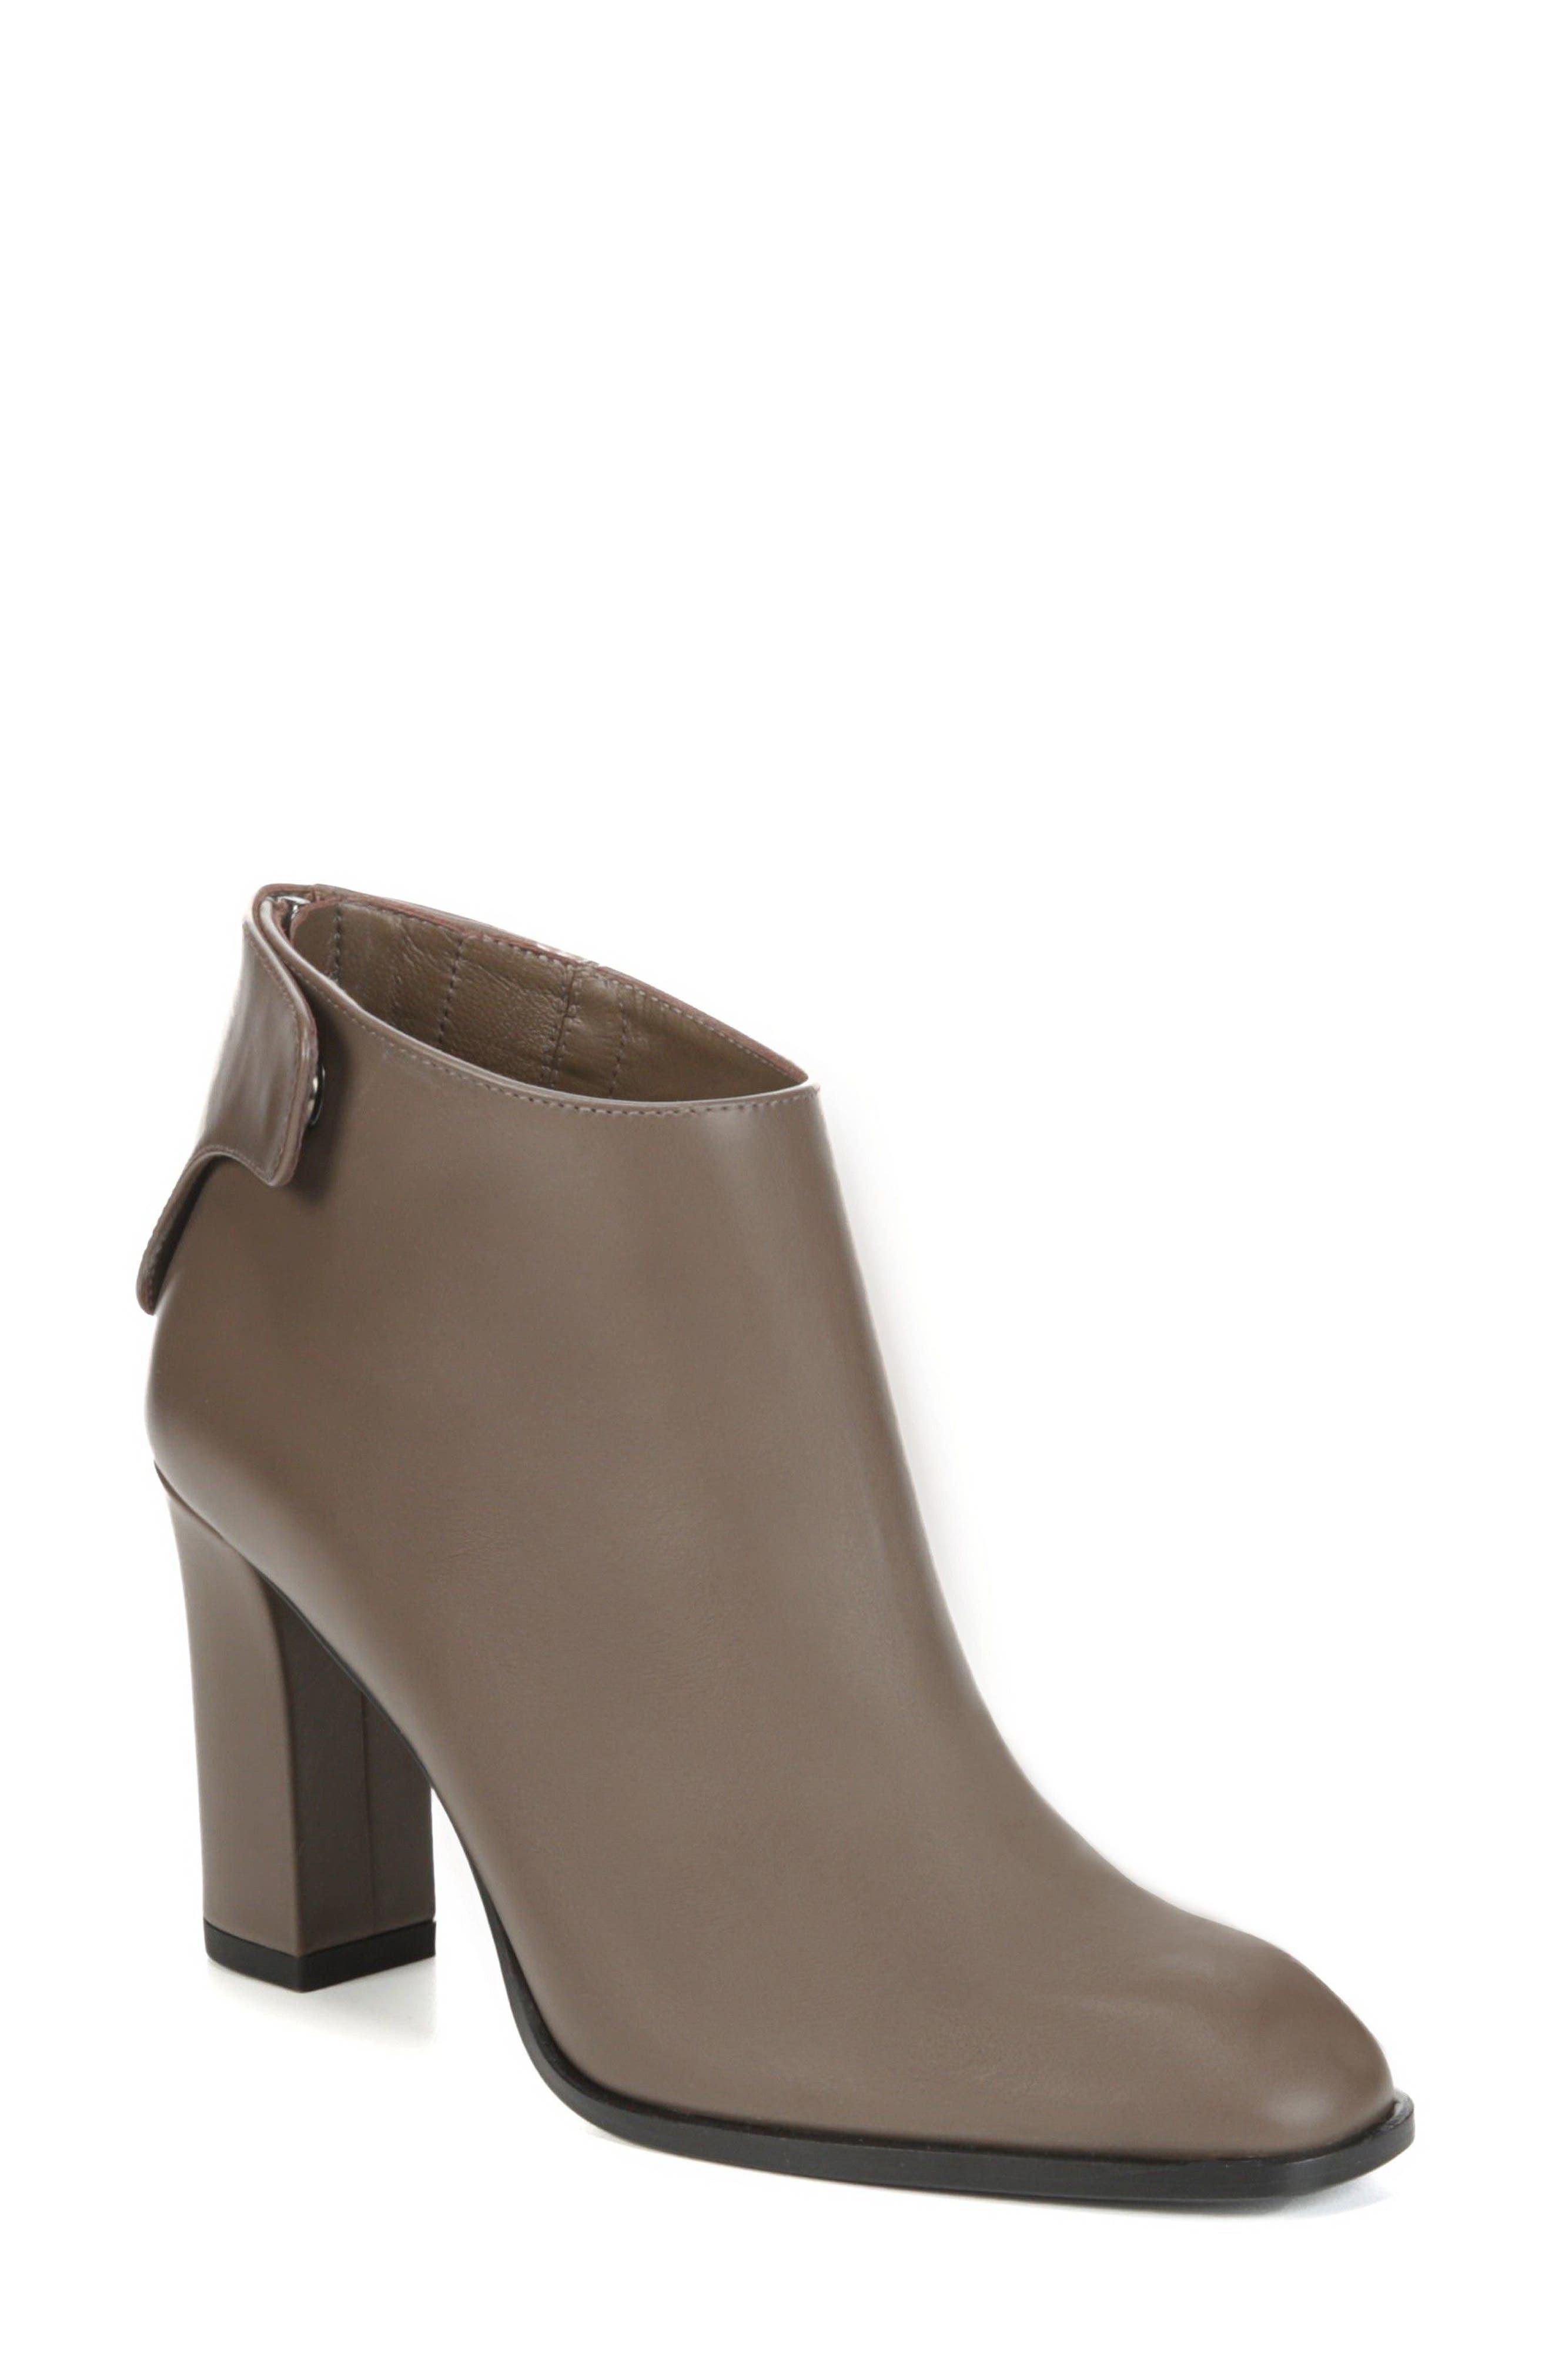 Alternate Image 1 Selected - Via Spiga Aston Ankle Boot (Women)